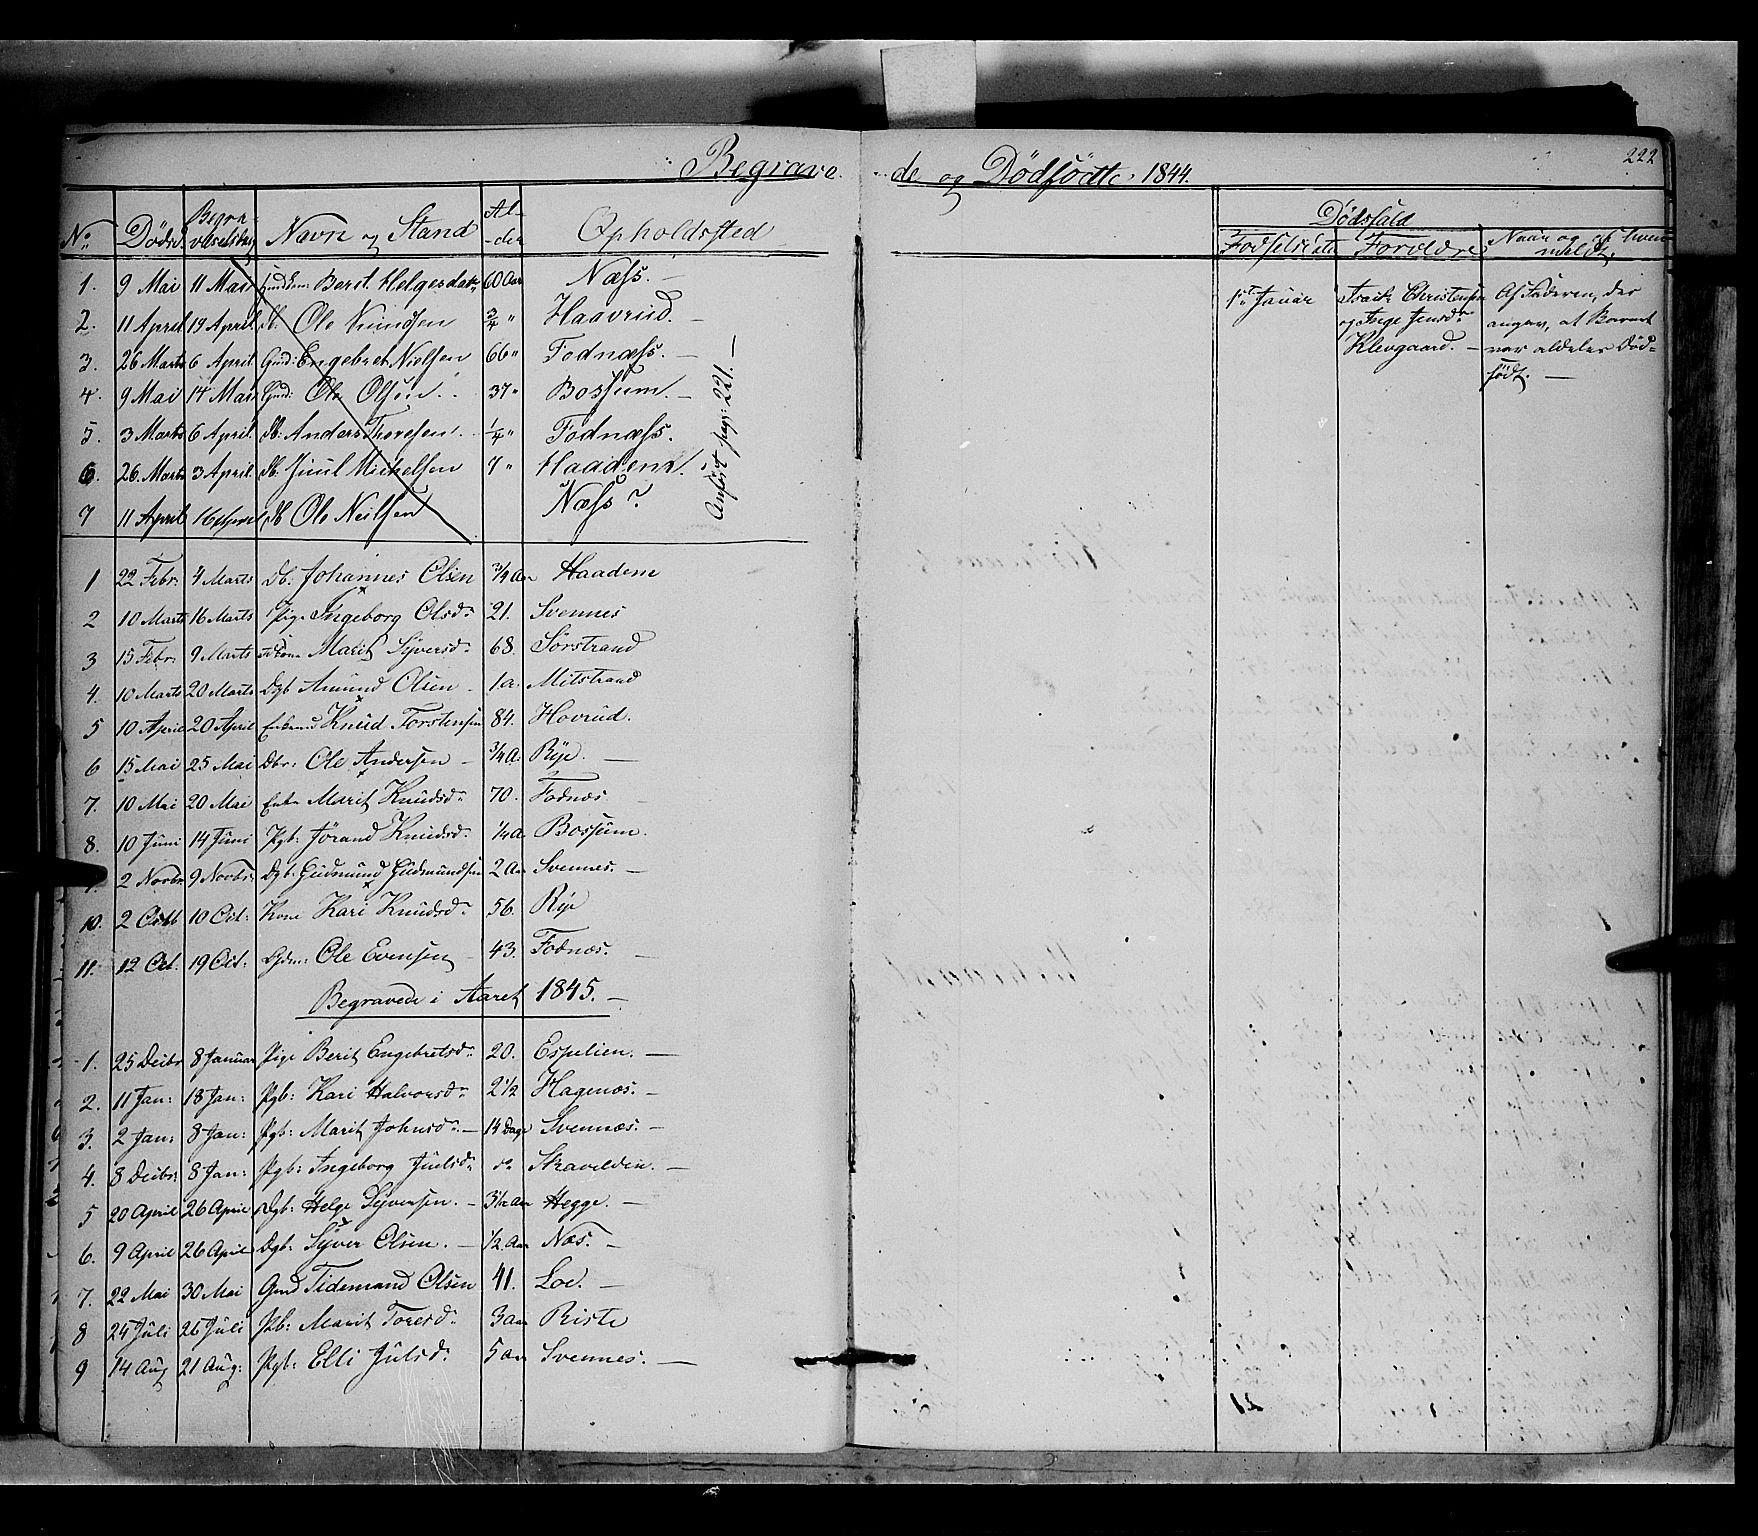 SAH, Nord-Aurdal prestekontor, Ministerialbok nr. 5, 1842-1863, s. 222